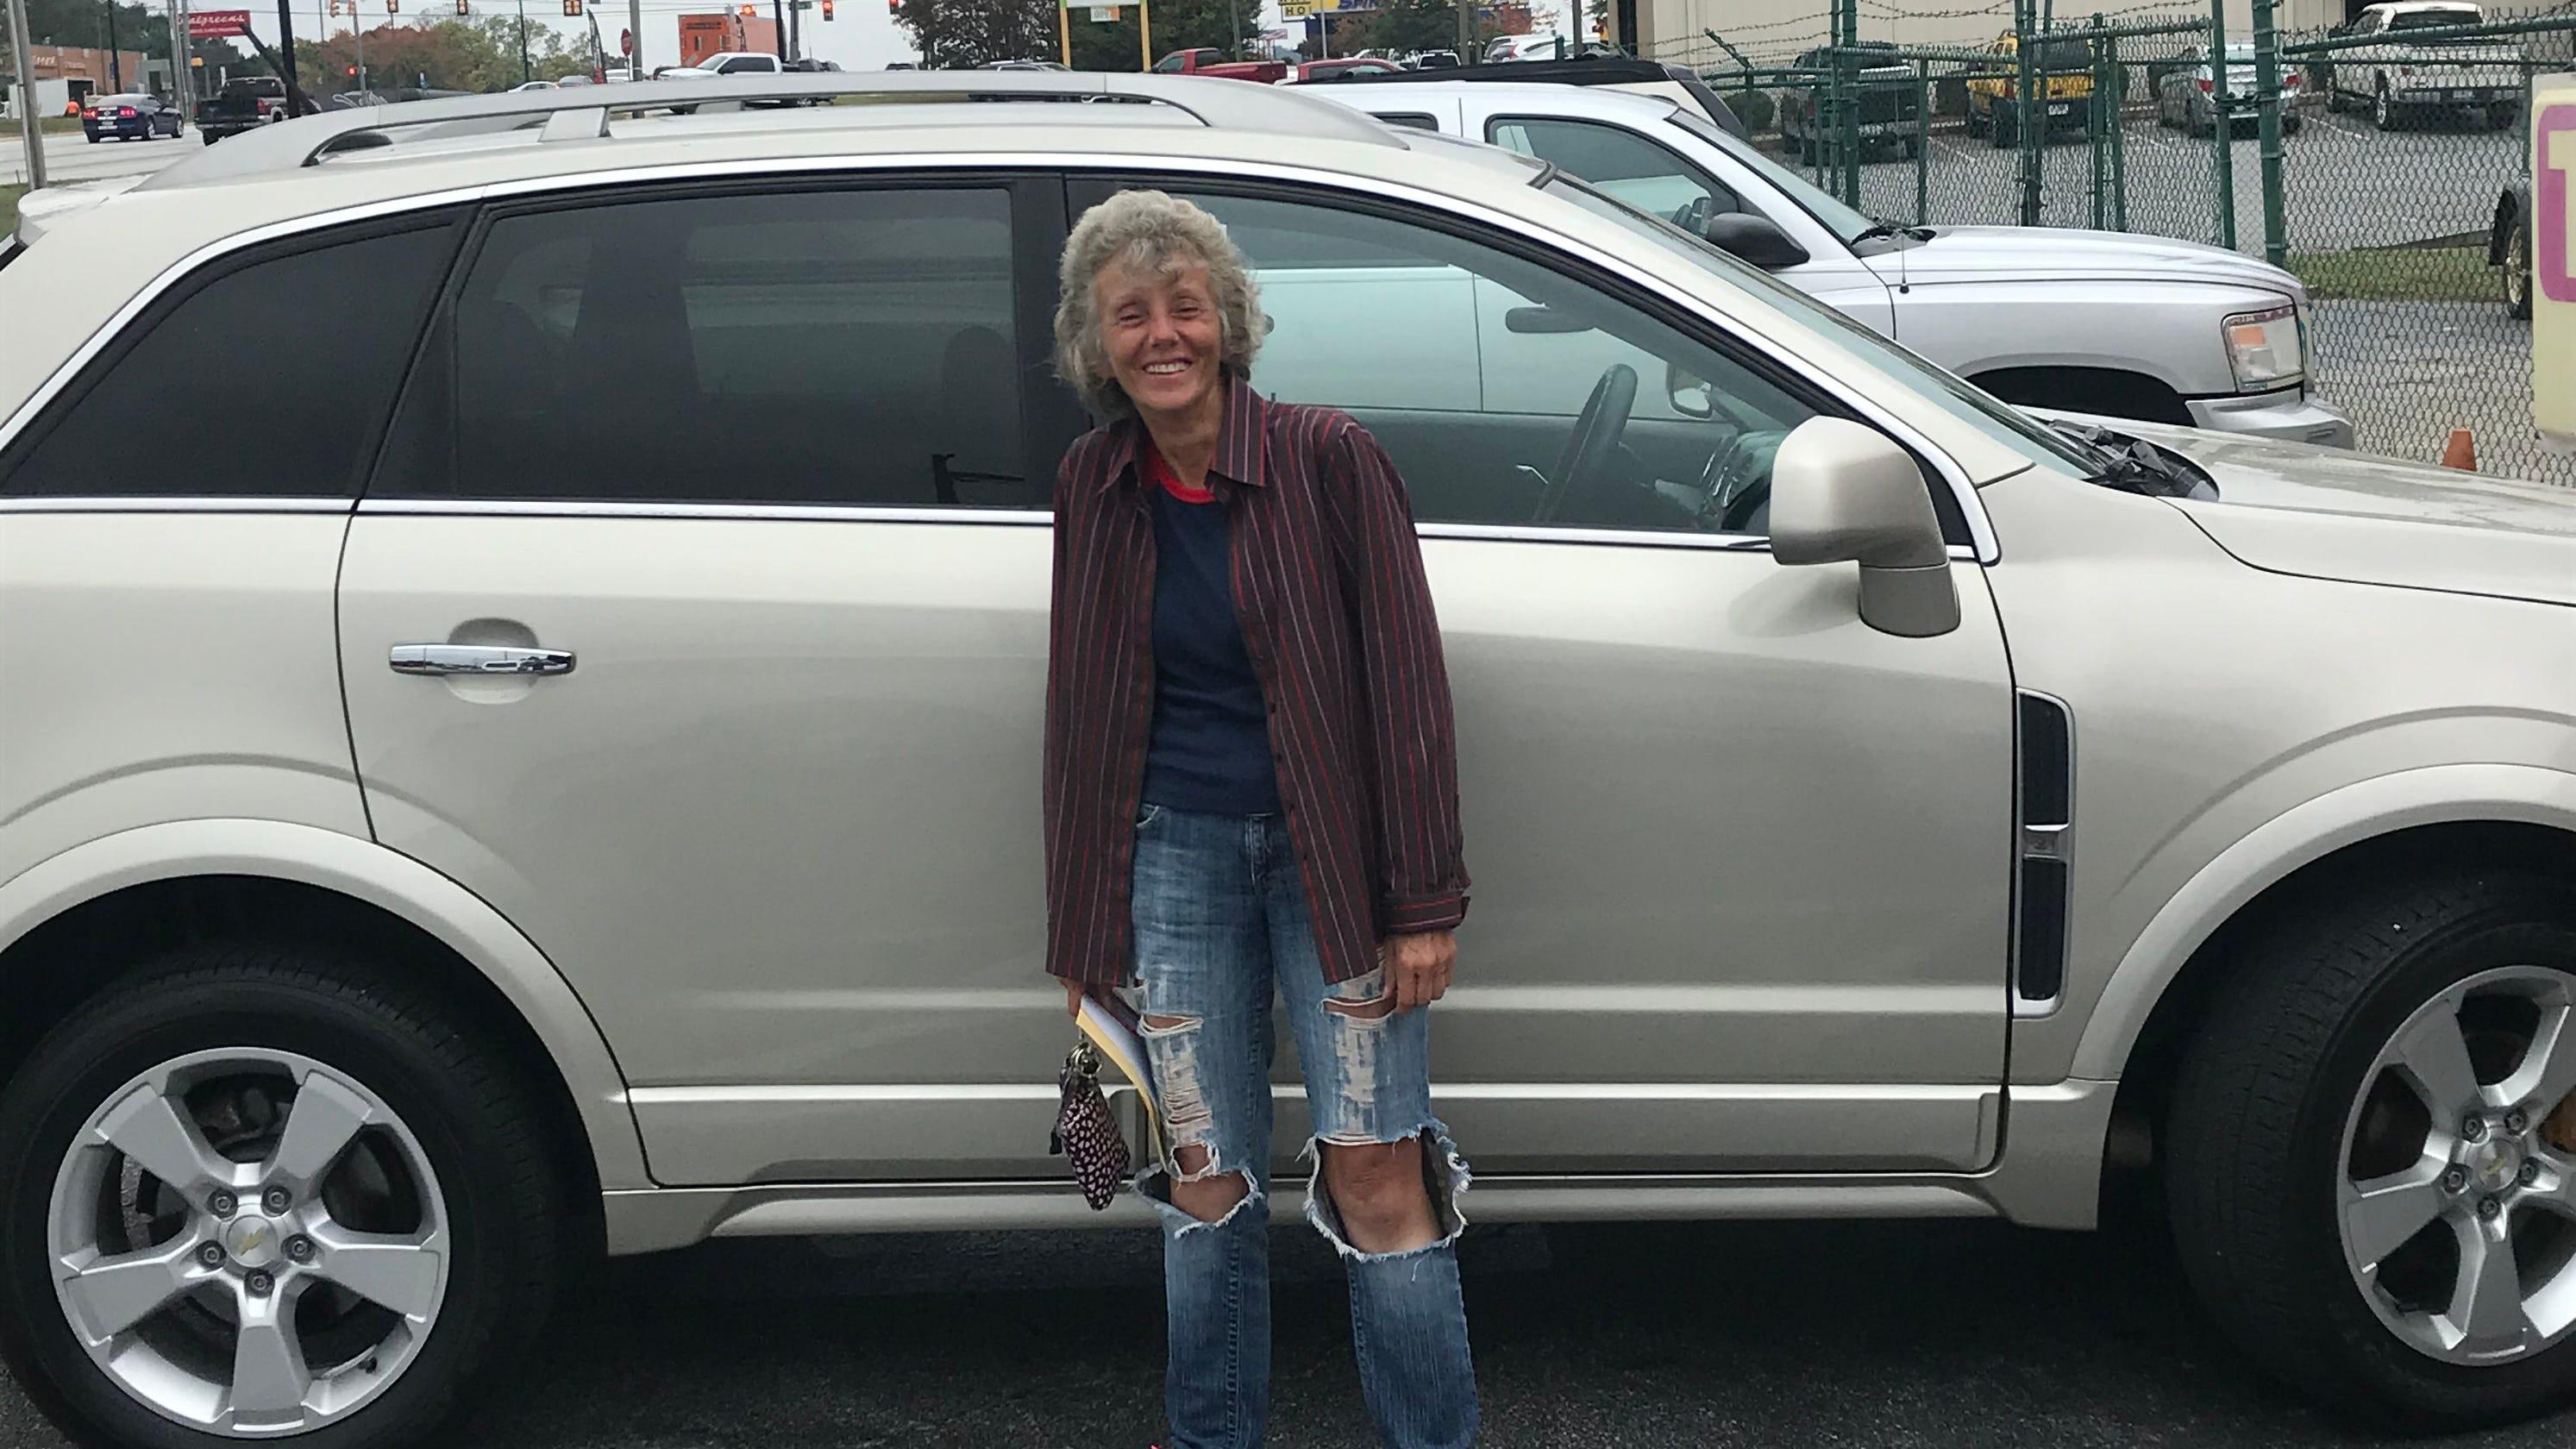 GoFundMe helps FedEx worker Darlene Quinn's 12-mile walk